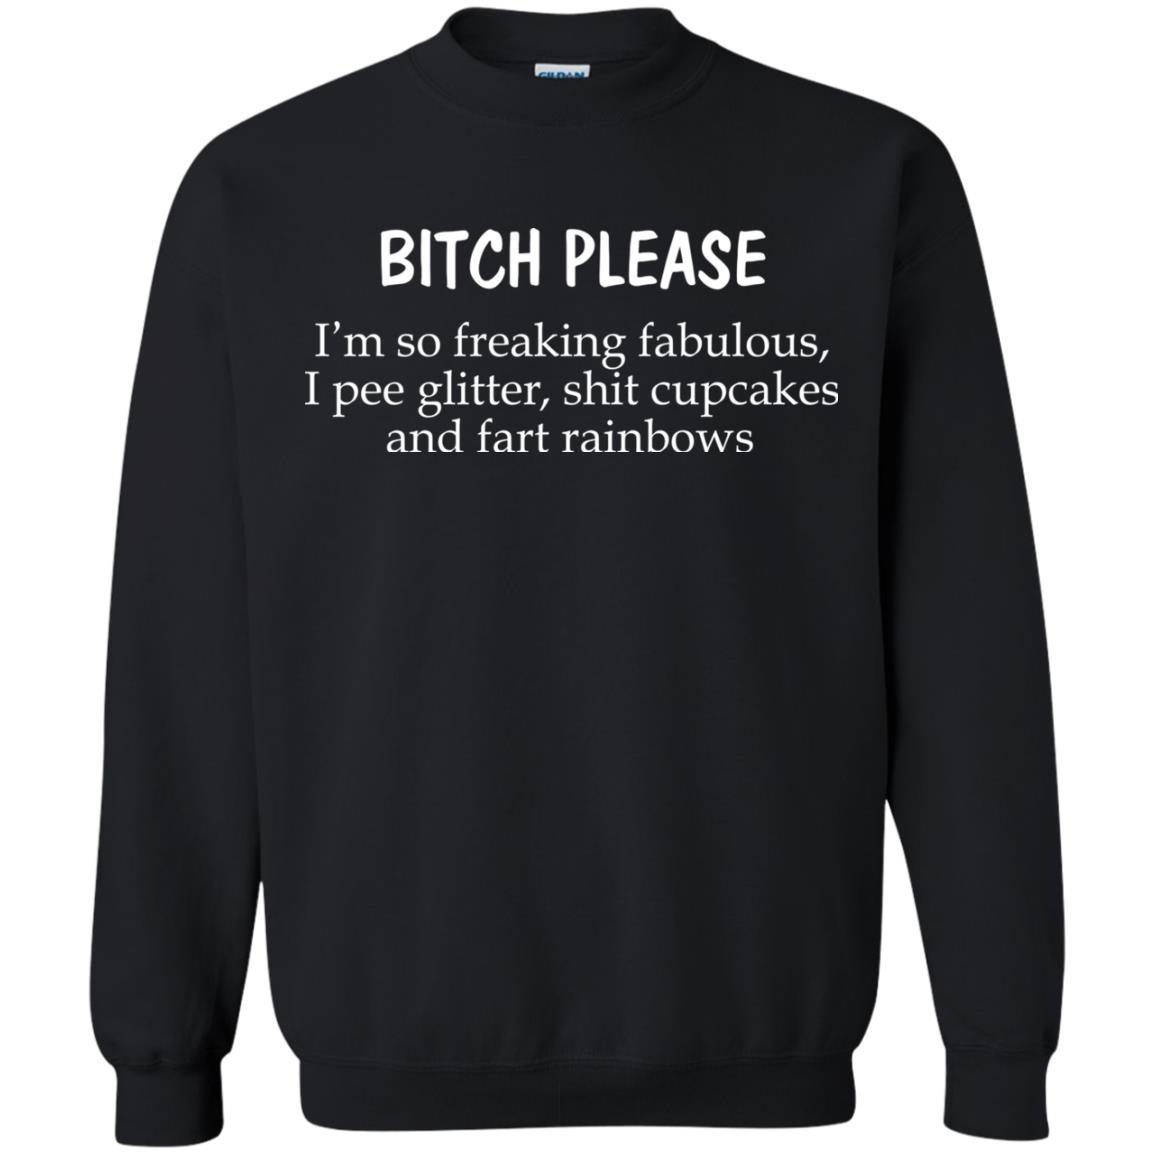 image 1248 - Bitch Please I'm so freaking fabulous t-shirt, sweater